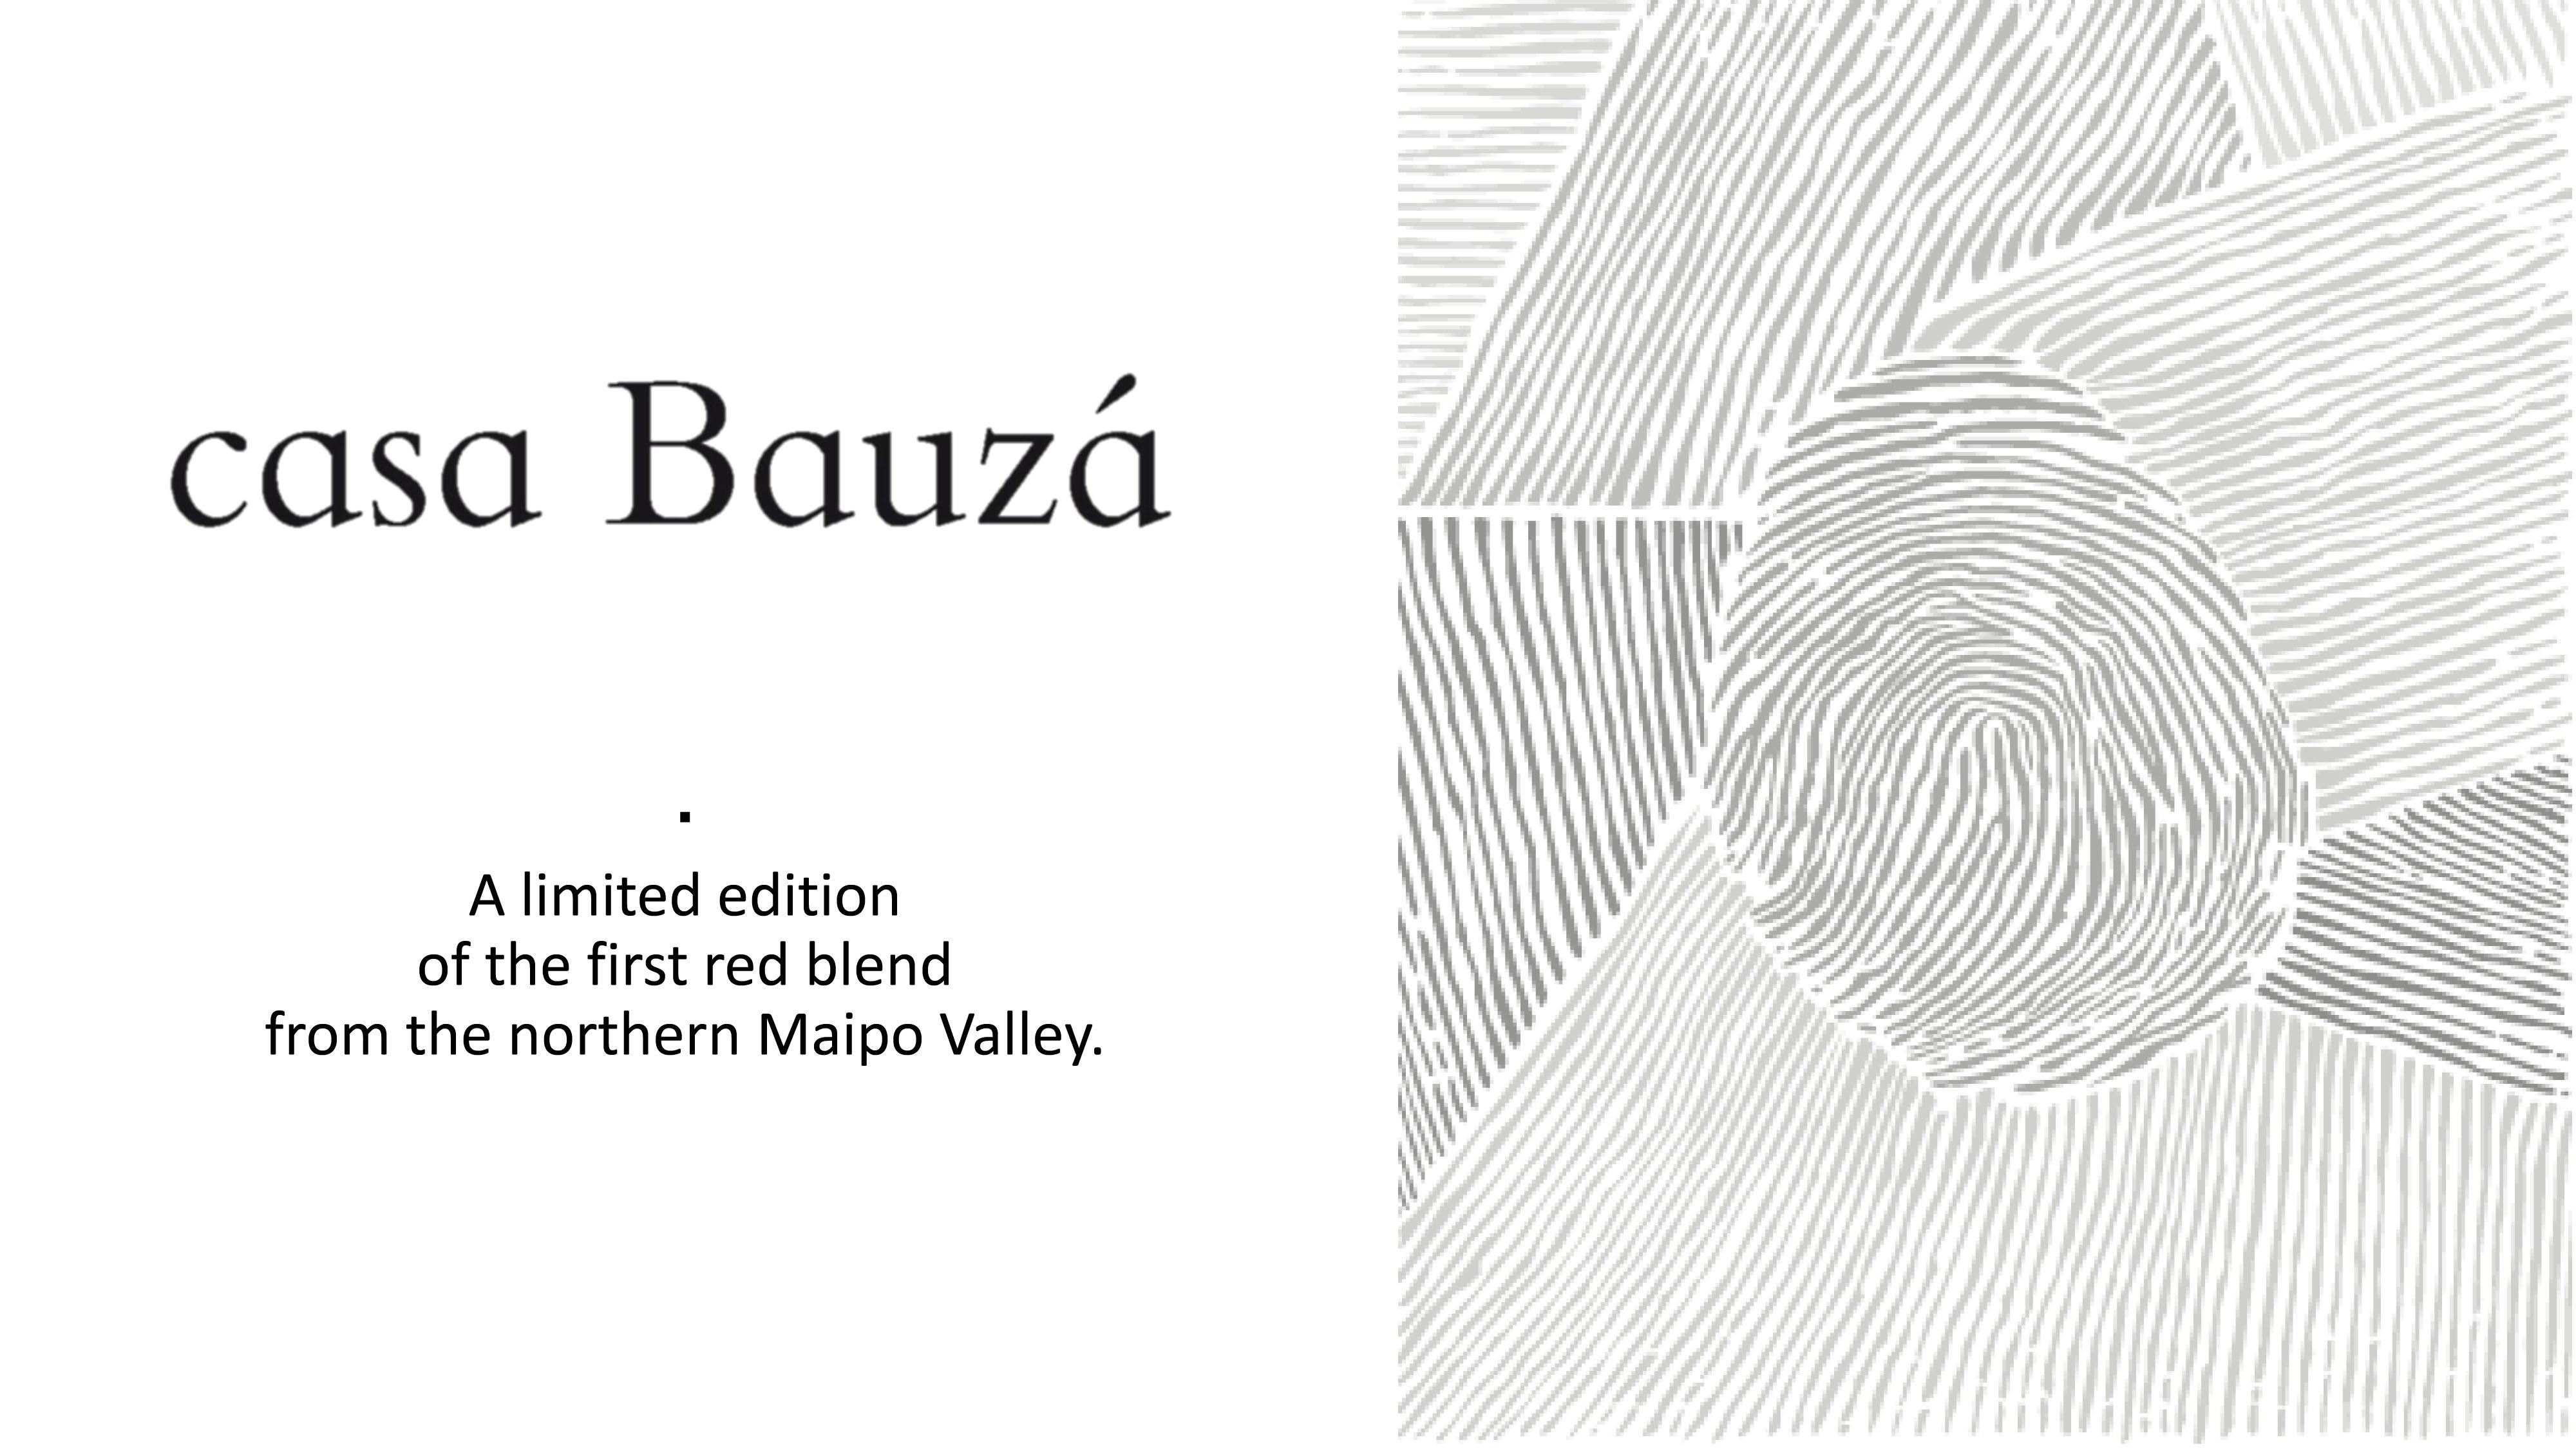 CASA BAUZÁ Presentation 2016 ENG-1